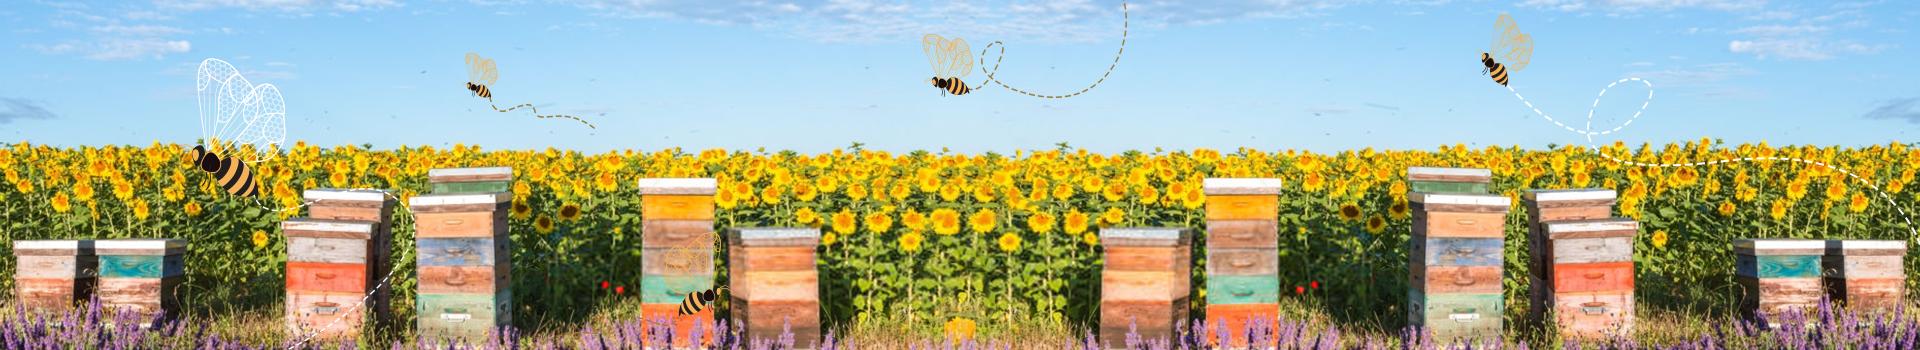 Honey bees in beekeeping - Geohoney